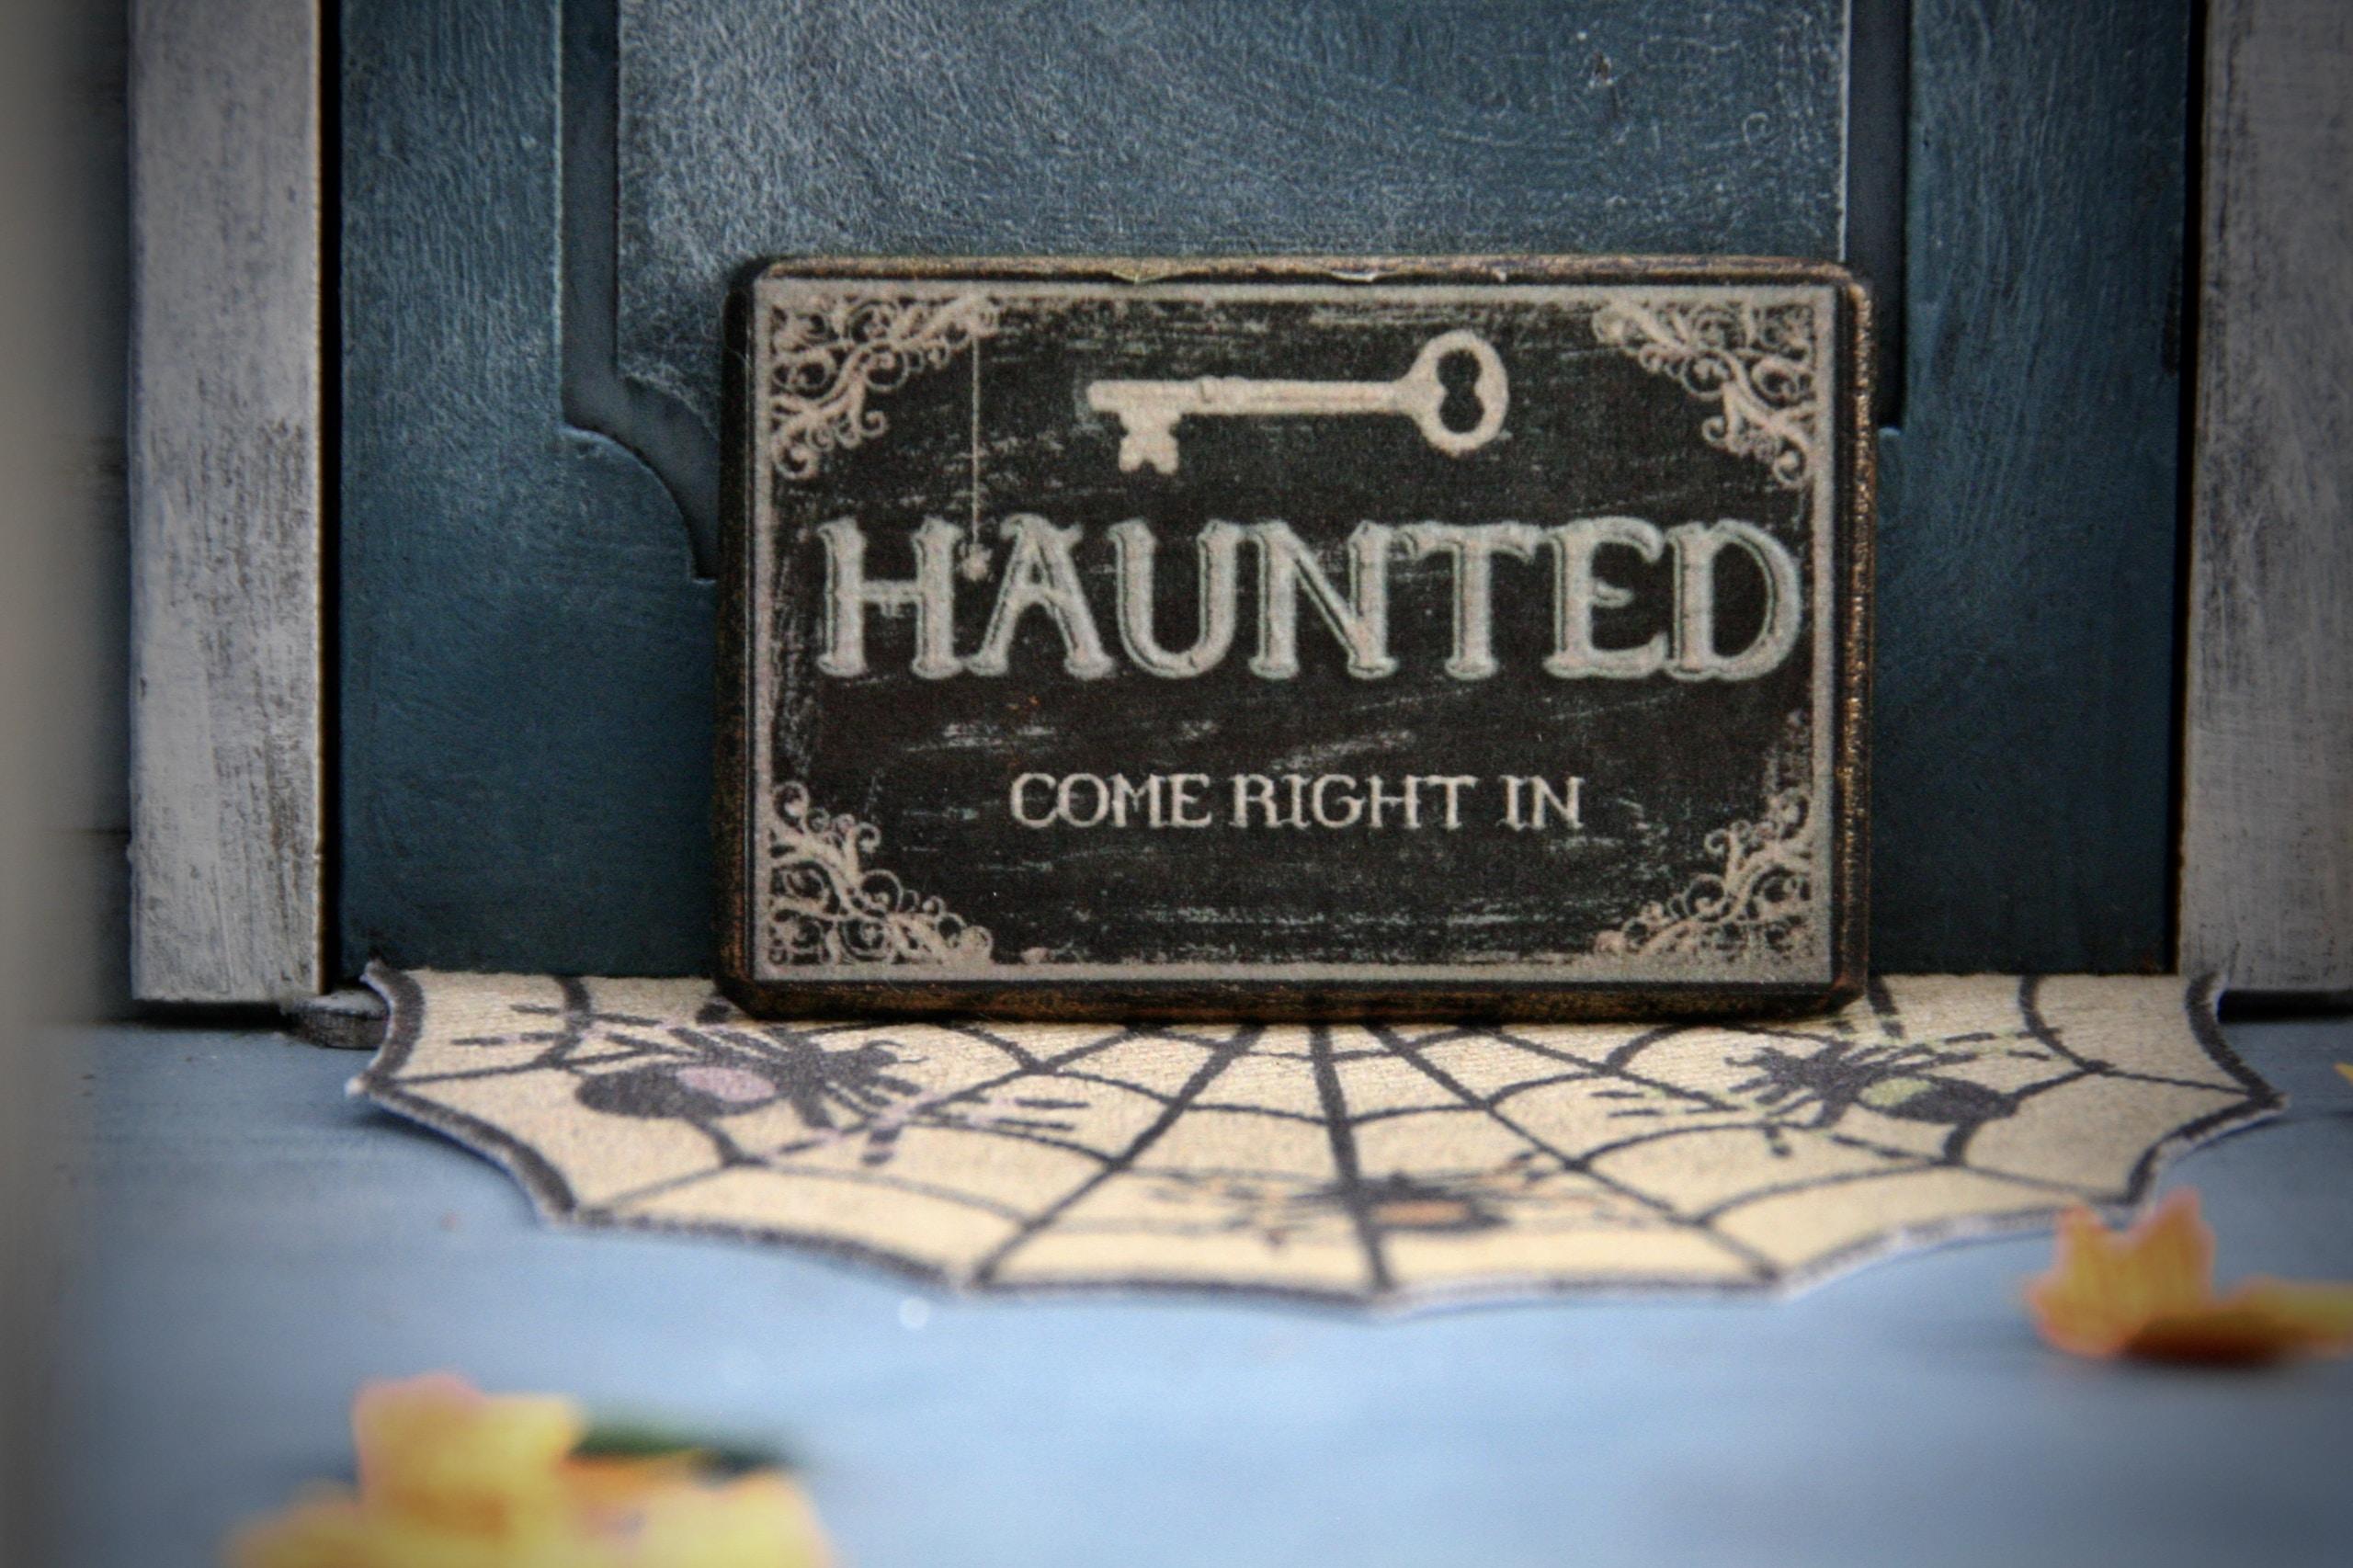 casa encantada, Haunted signage